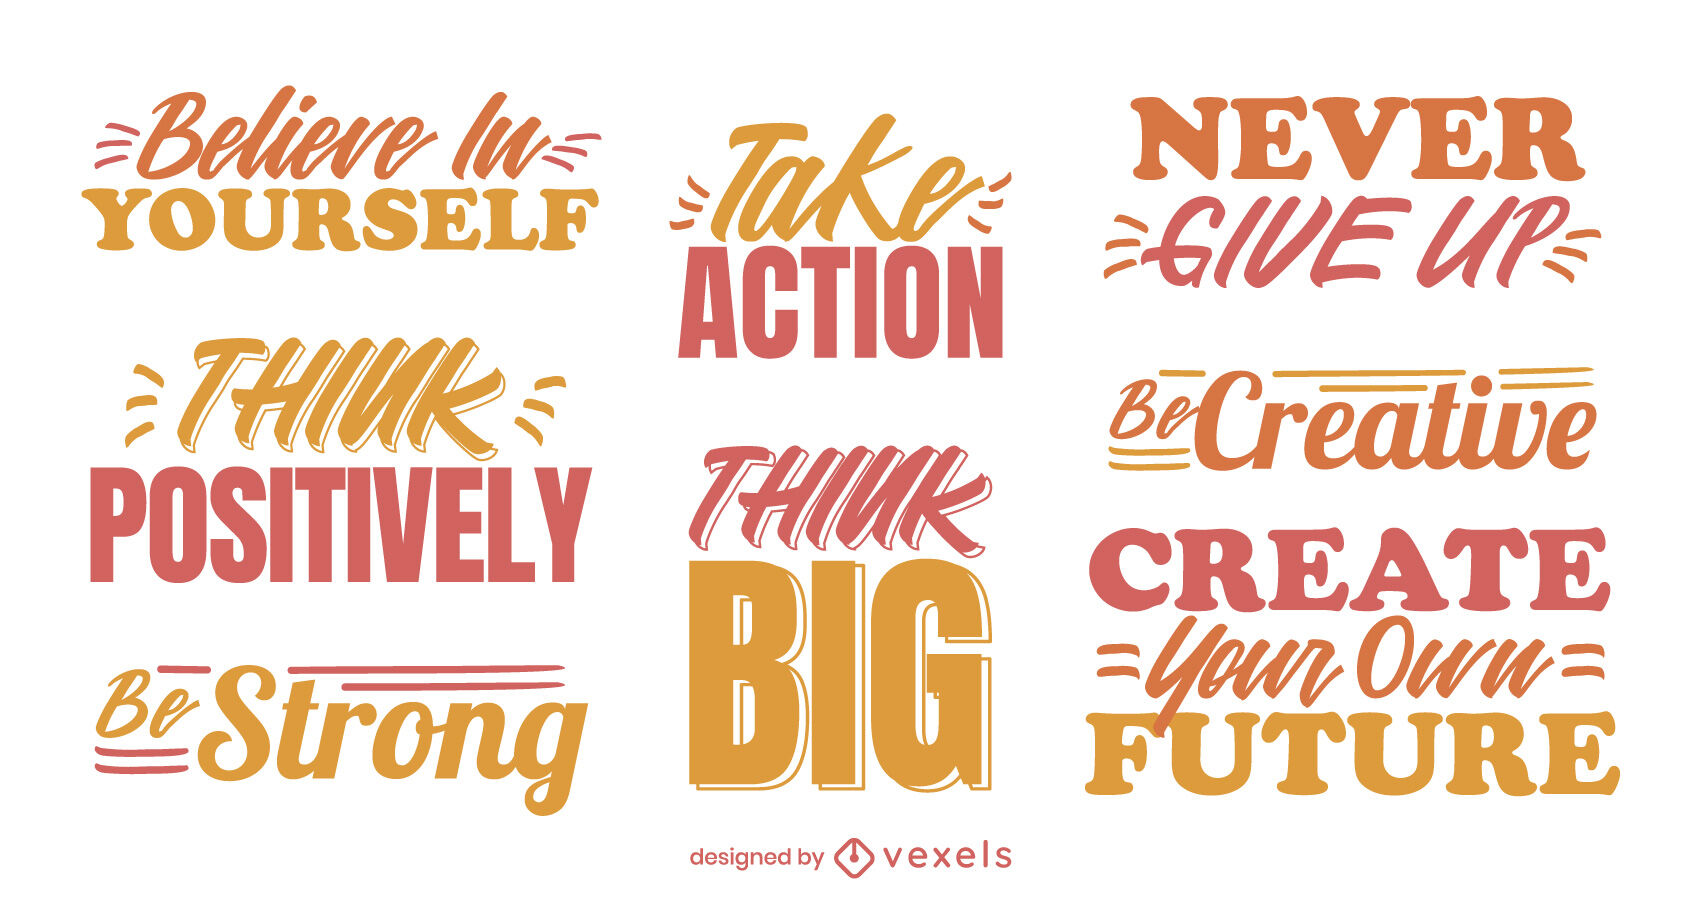 Cool motivational quotes set